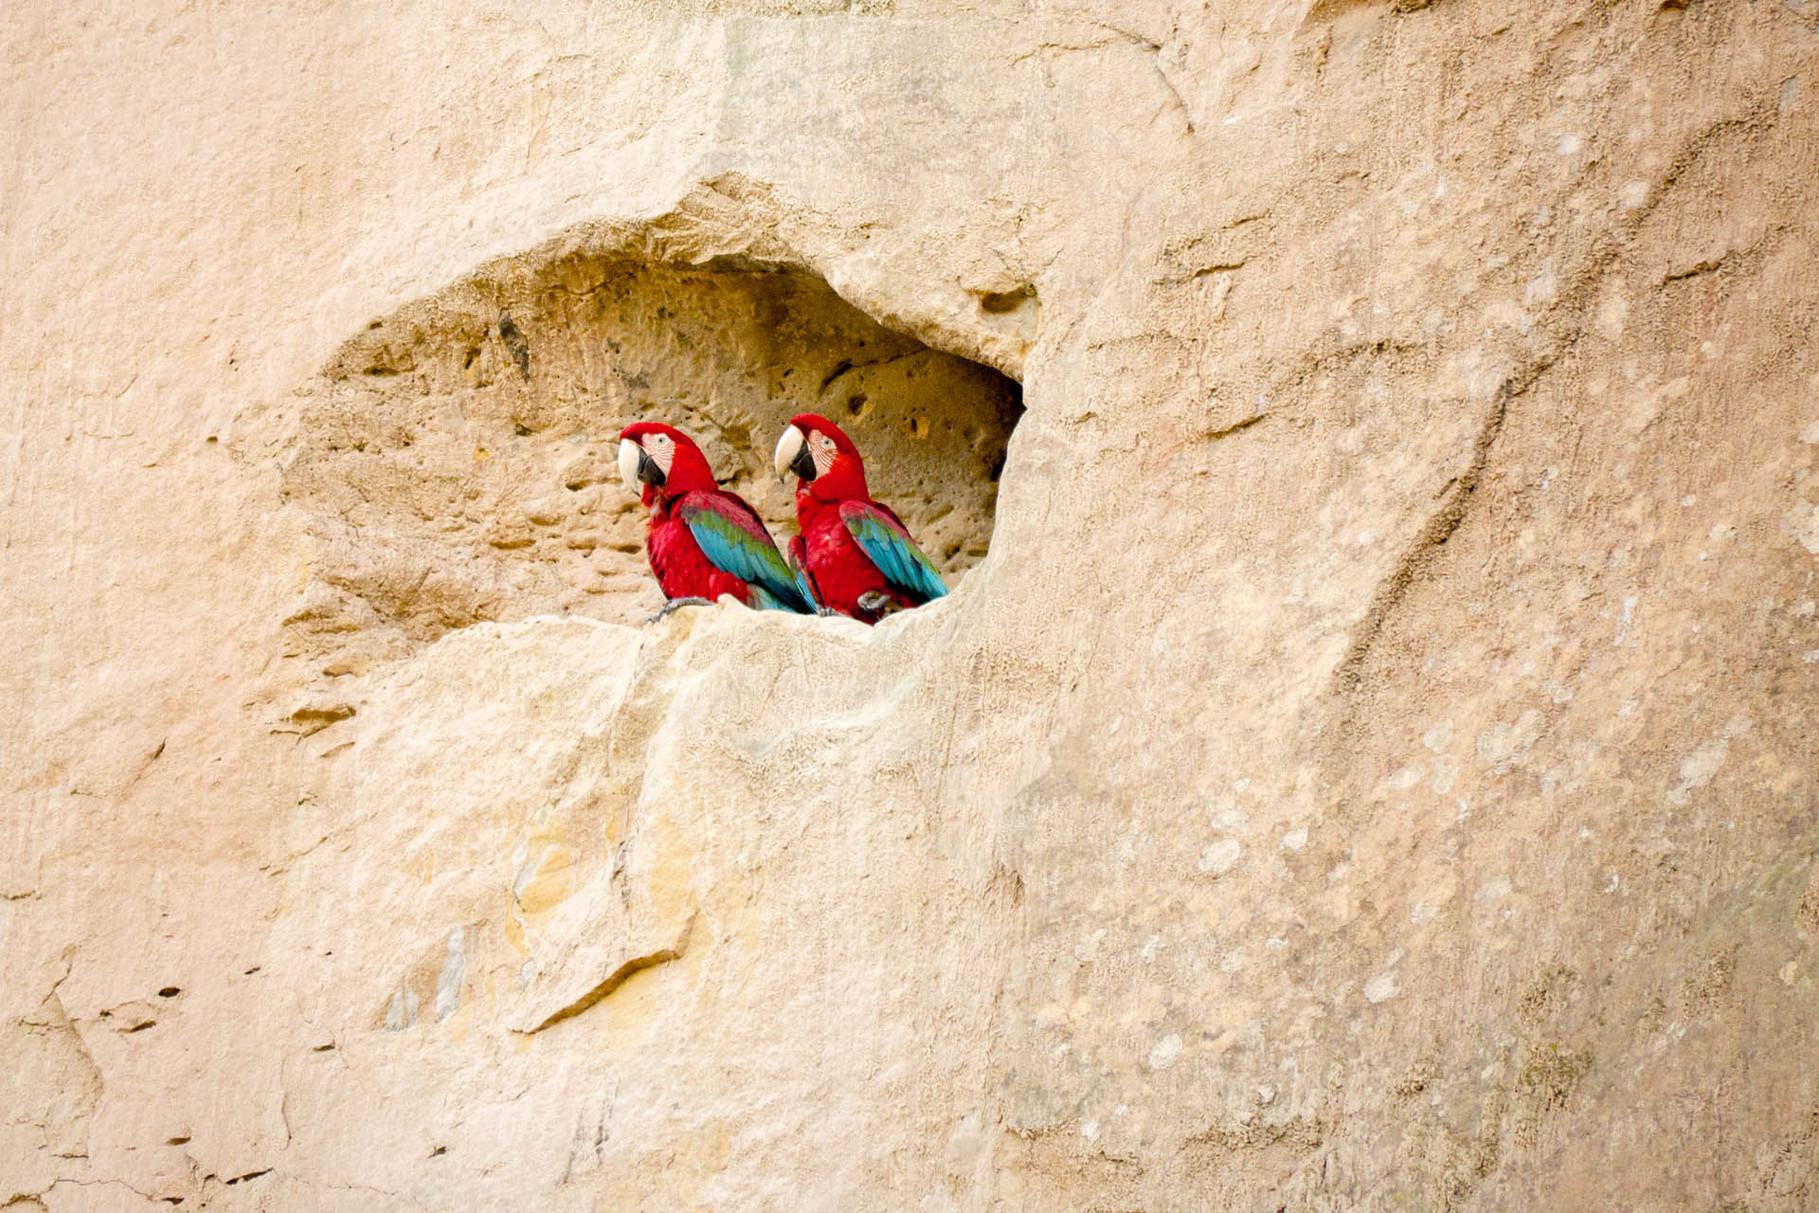 Nesting macaws at a cliff, protected from most predators, Madidi Nationalpark [Bolivia, 2014]